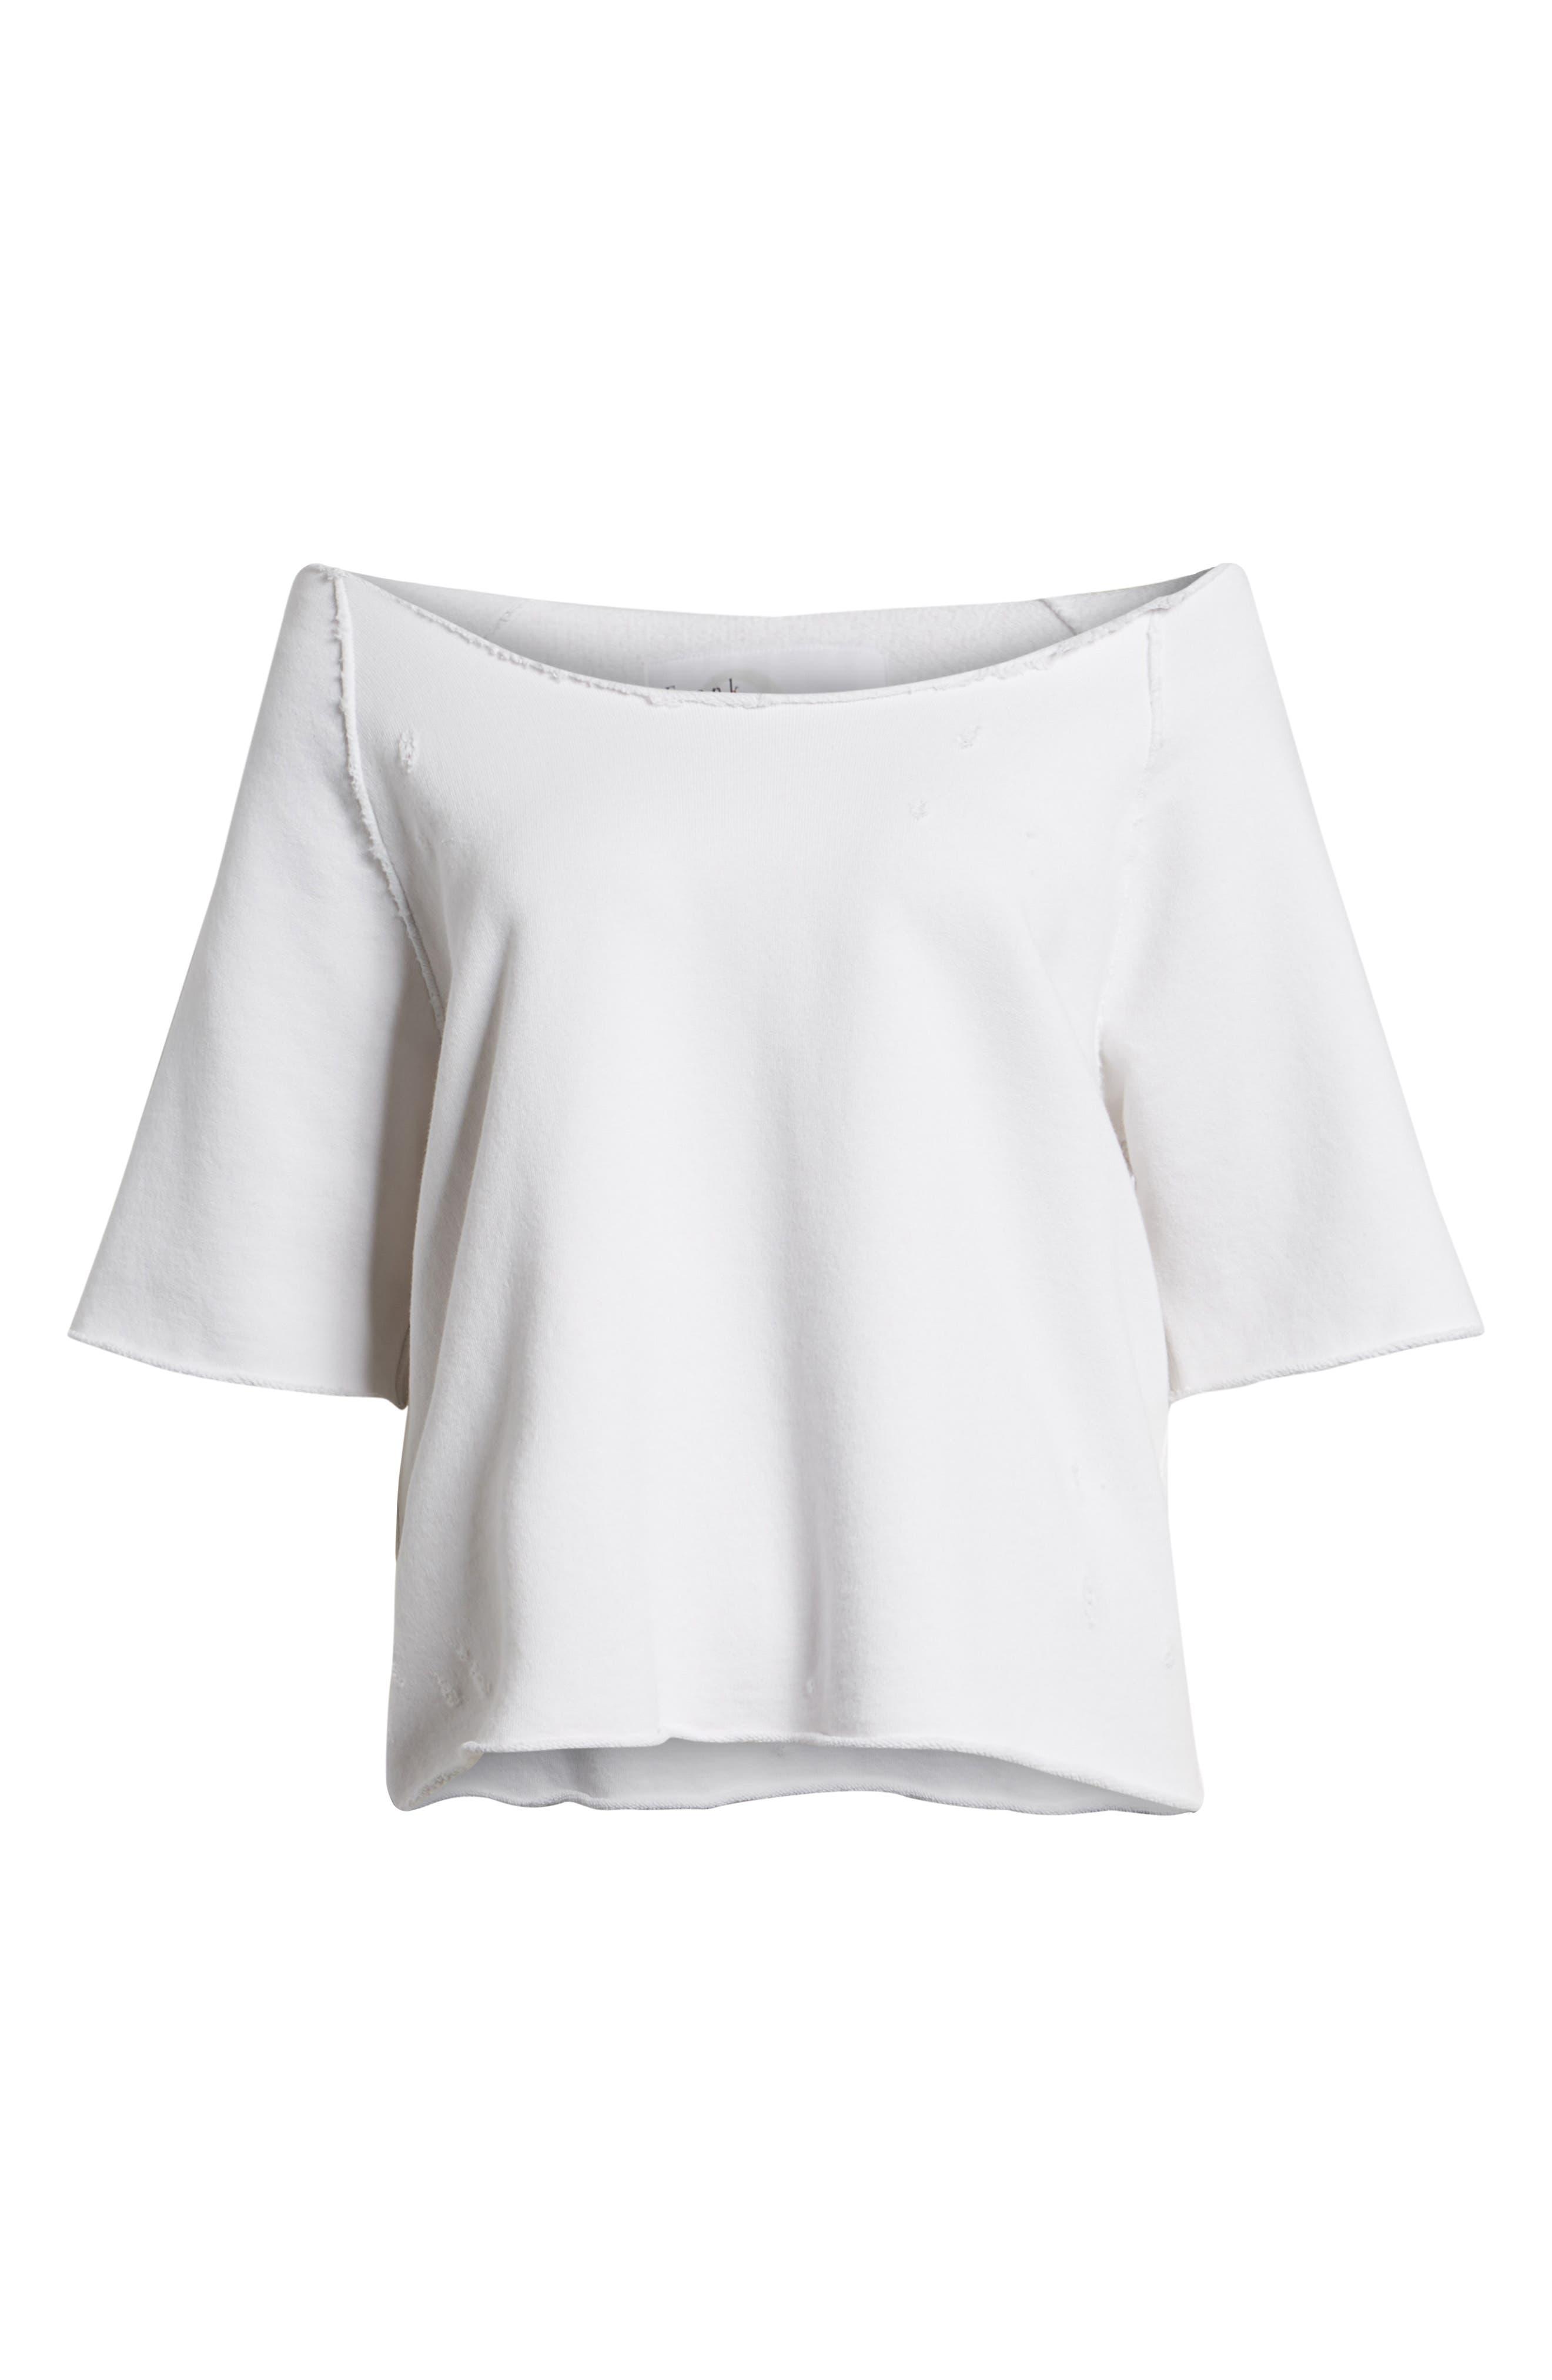 Raglan Off the Shoulder Sweatshirt,                             Alternate thumbnail 7, color,                             100